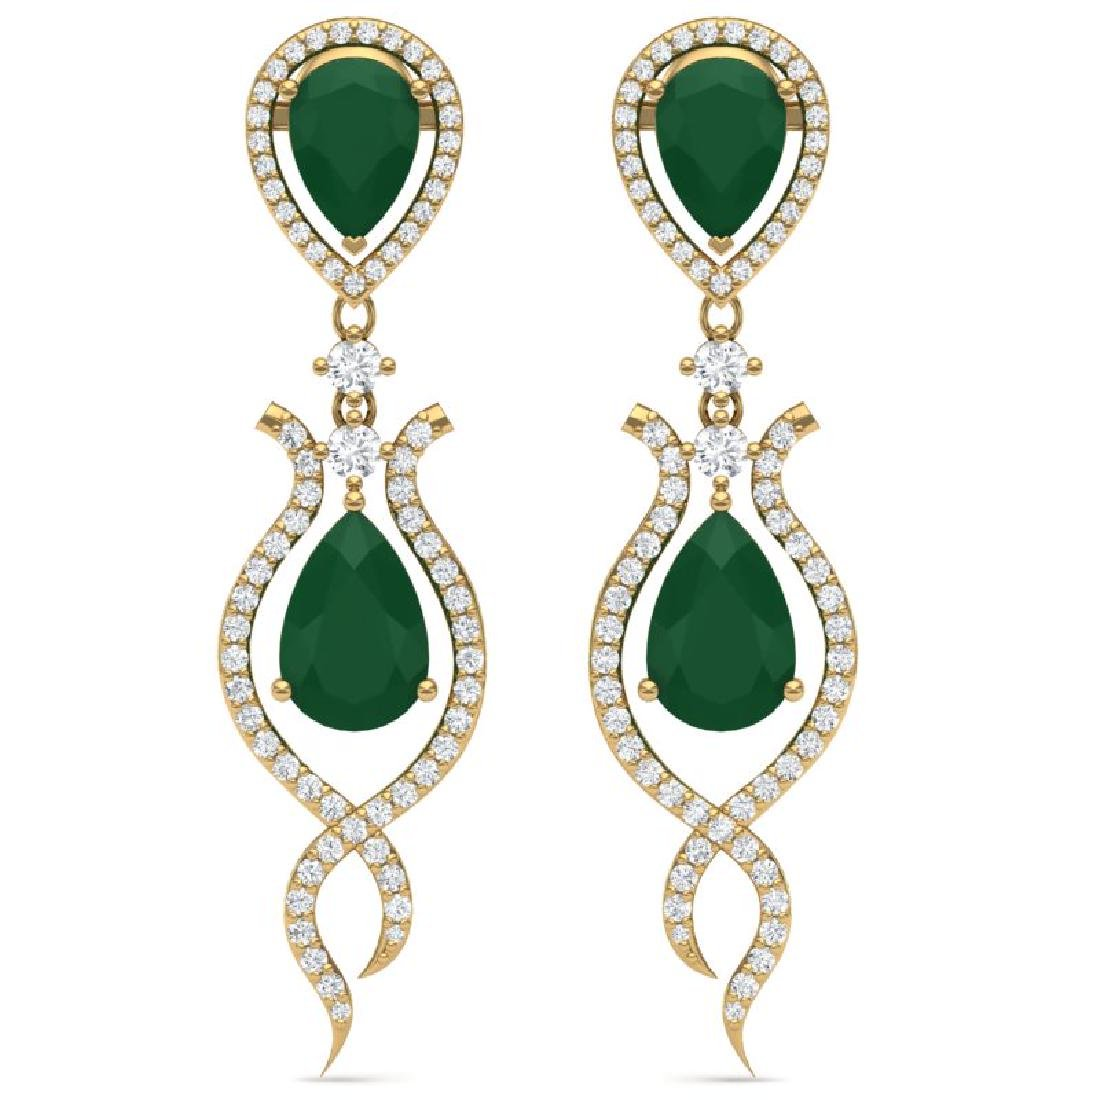 16.57 CTW Royalty Emerald & VS Diamond Earrings 18K